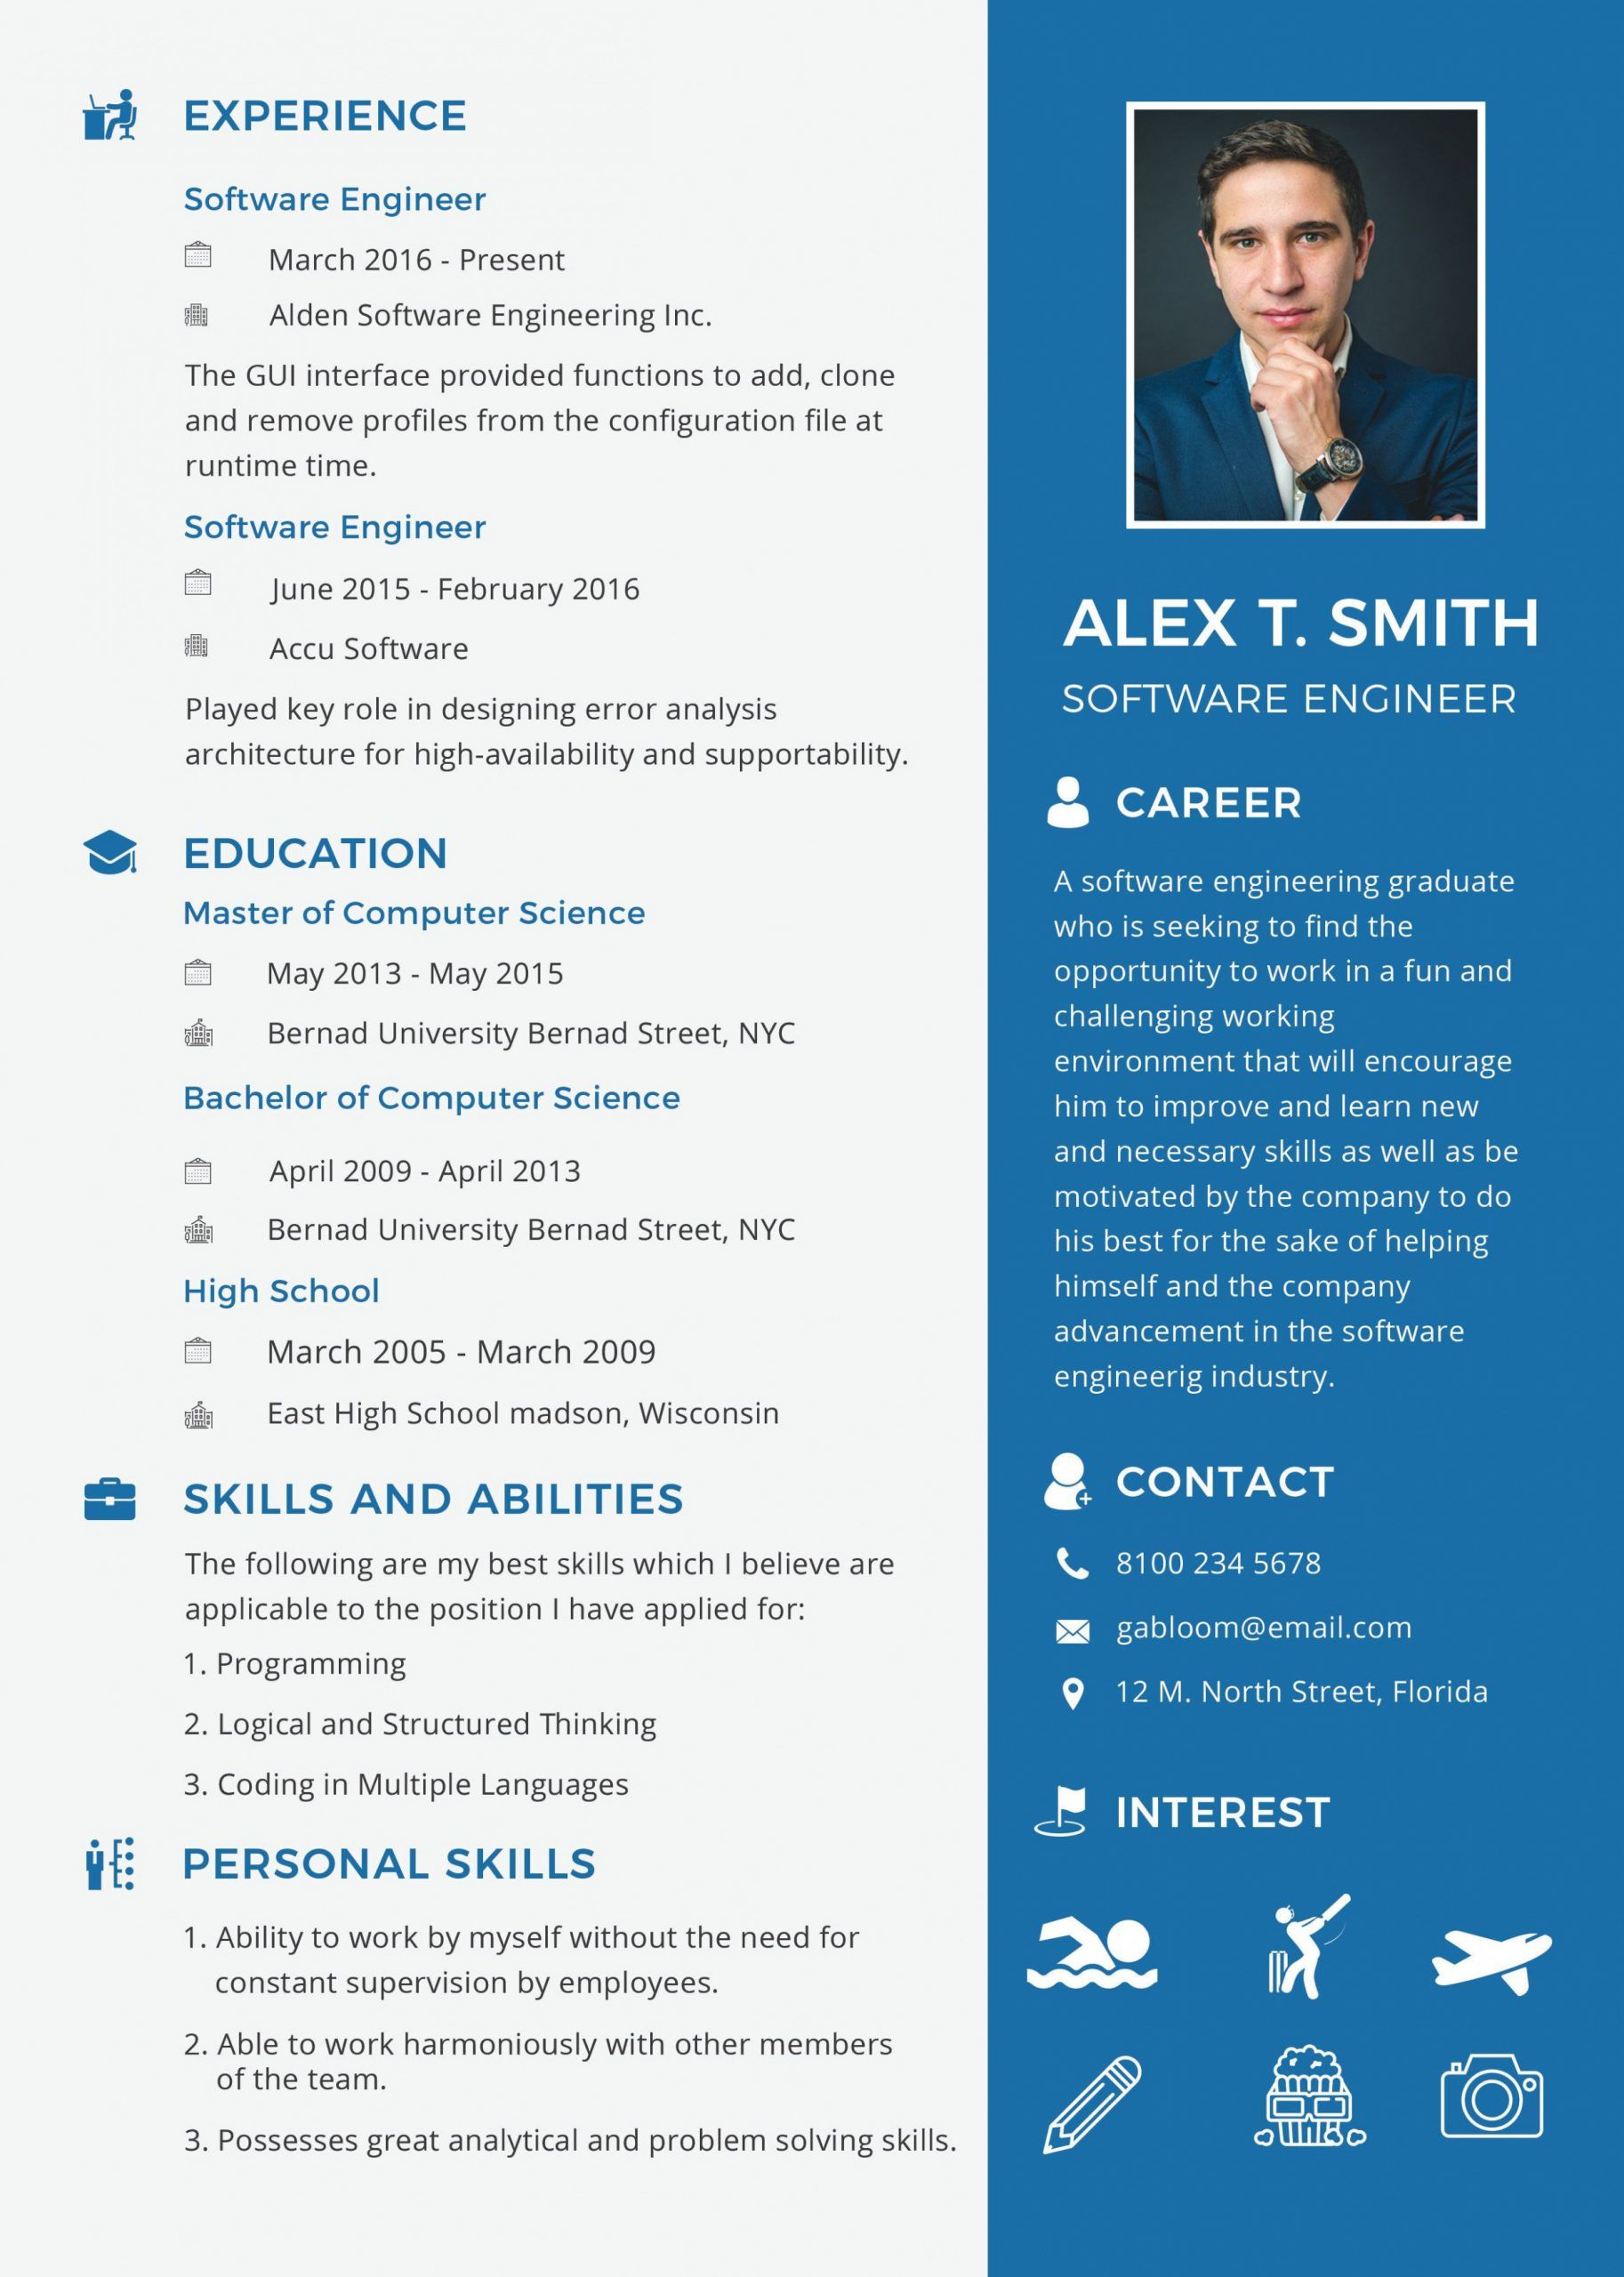 Best Resume Format Doc Resume Computer Science Engineering Cv Best Resume For Freshers Engineer Best Resume Format Resume Format For Freshers Job Resume Format